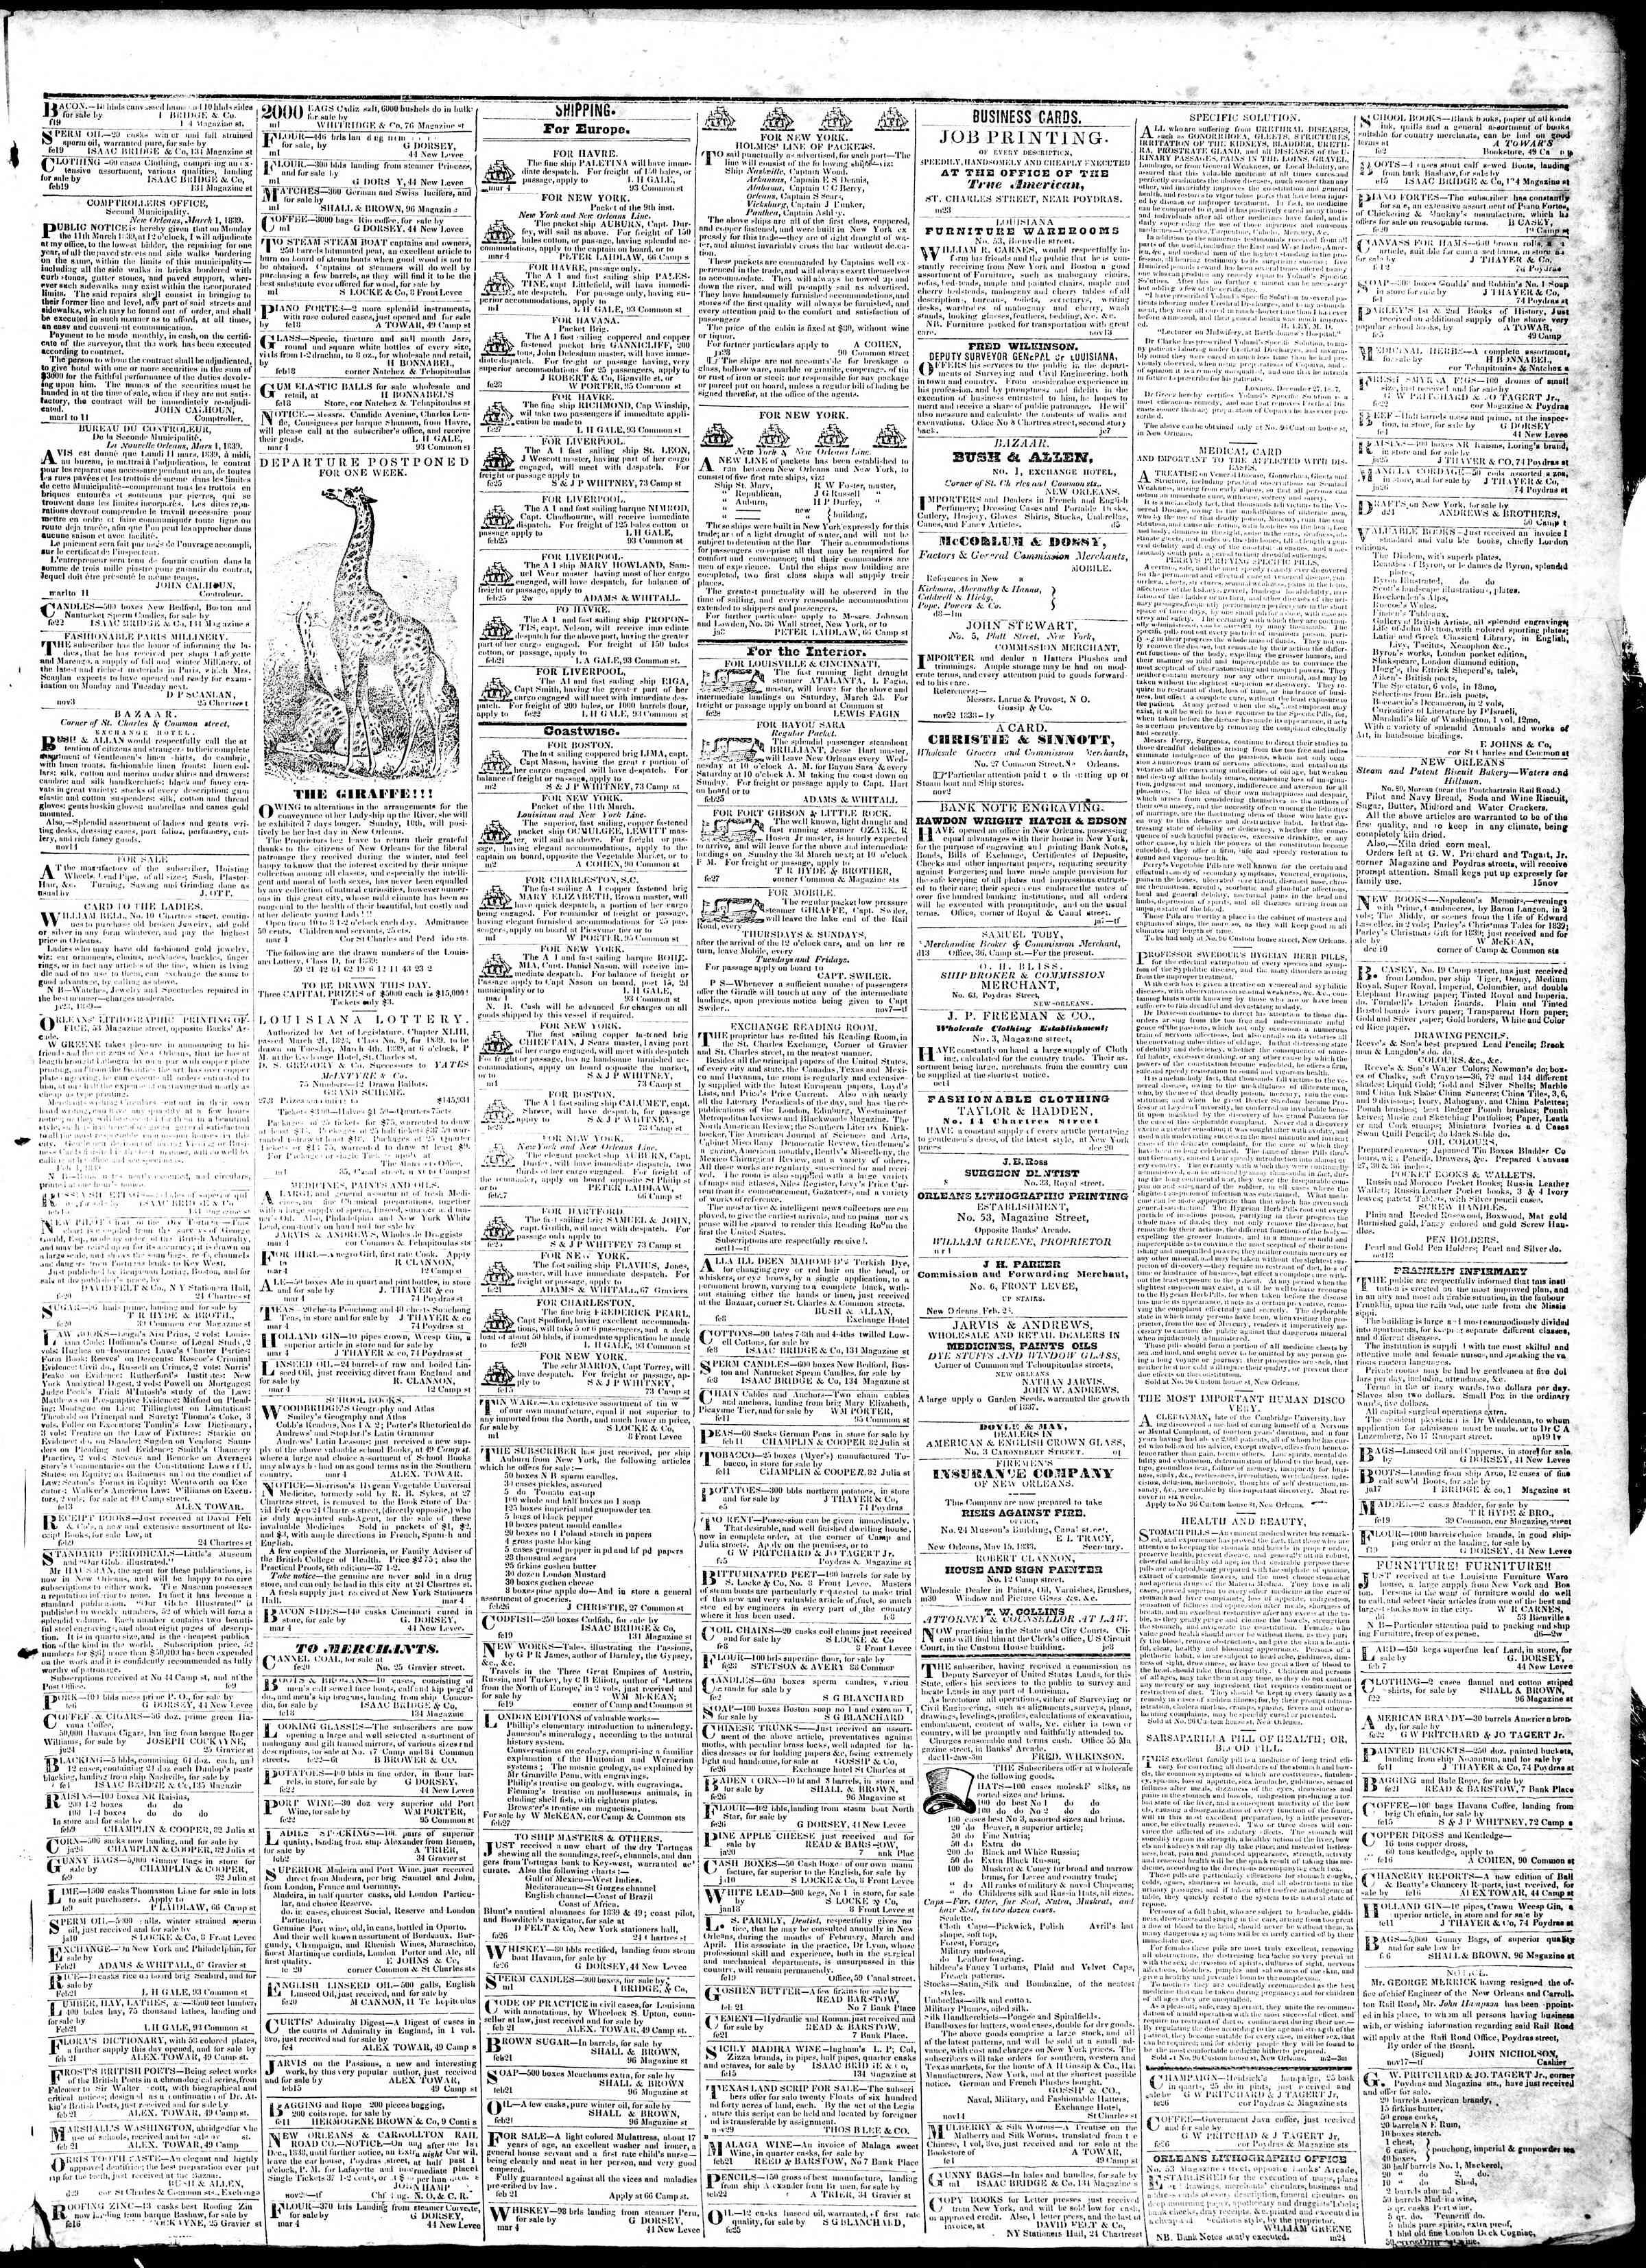 March 5, 1839 Tarihli True American Gazetesi Sayfa 3